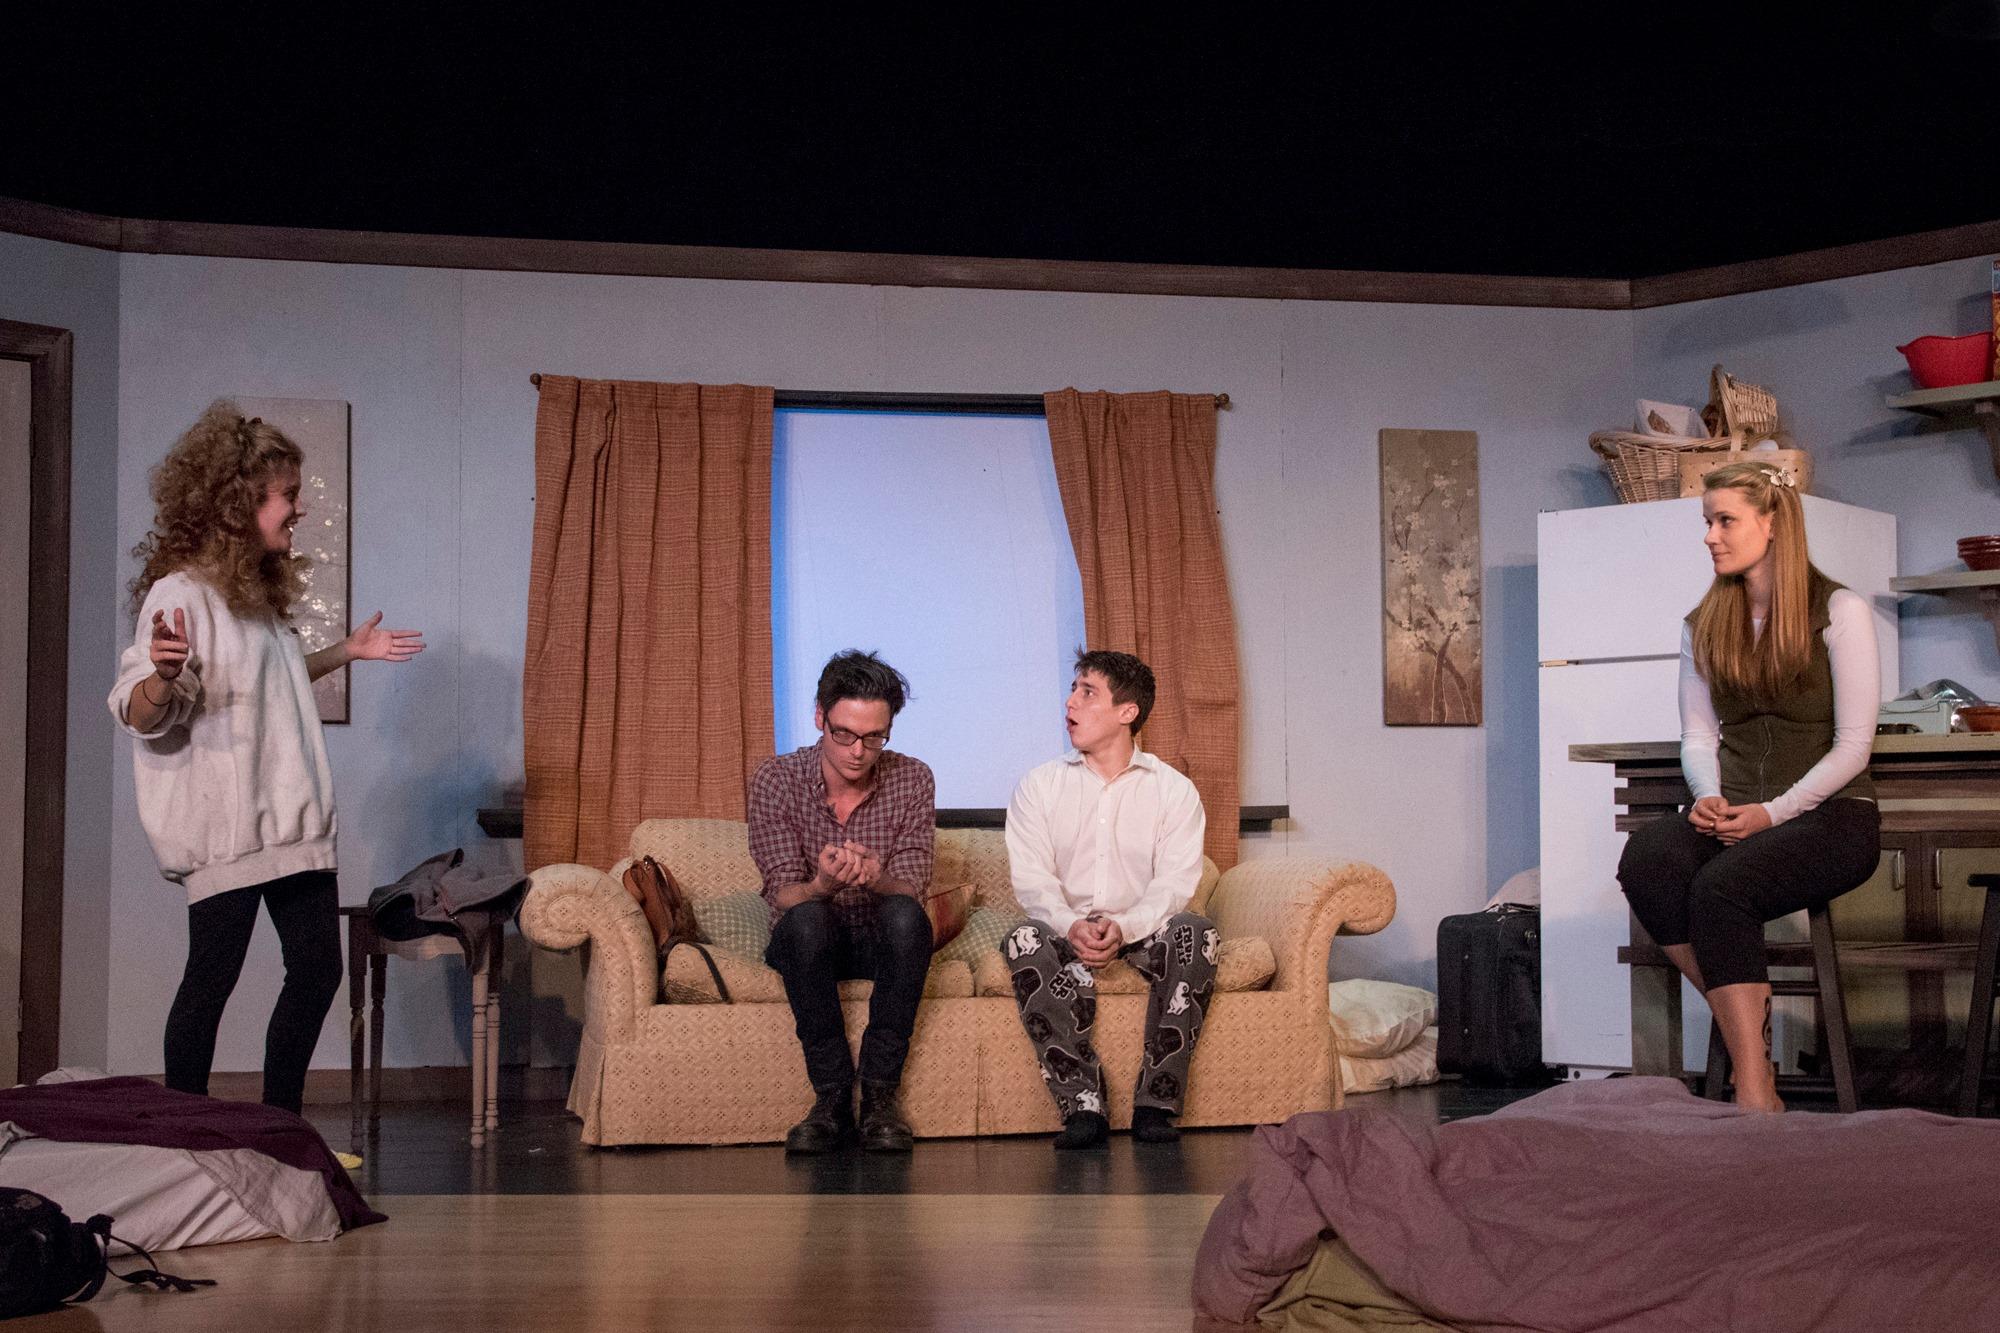 BWW Review: Jewish Family Theatre's Encore Presentation of BAD JEWS is Viciously Good Fun